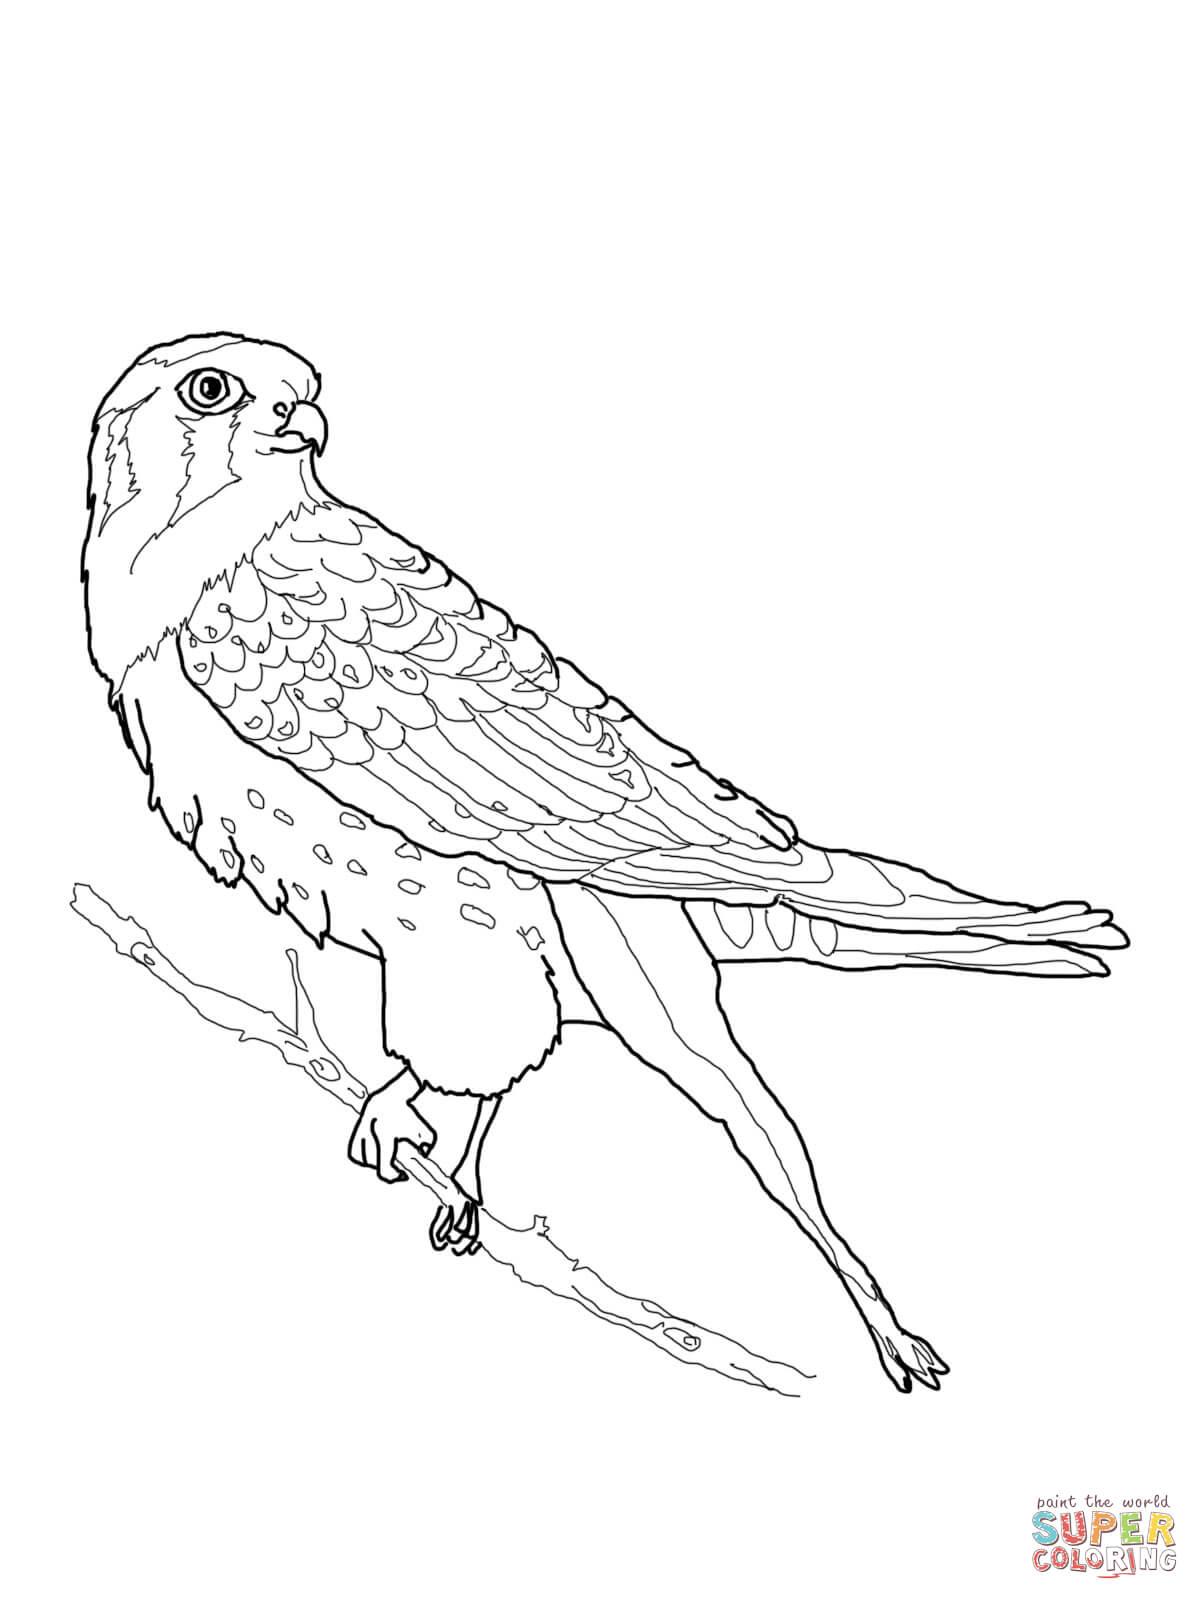 Dibujo de Cernícalo americano posando para colorear